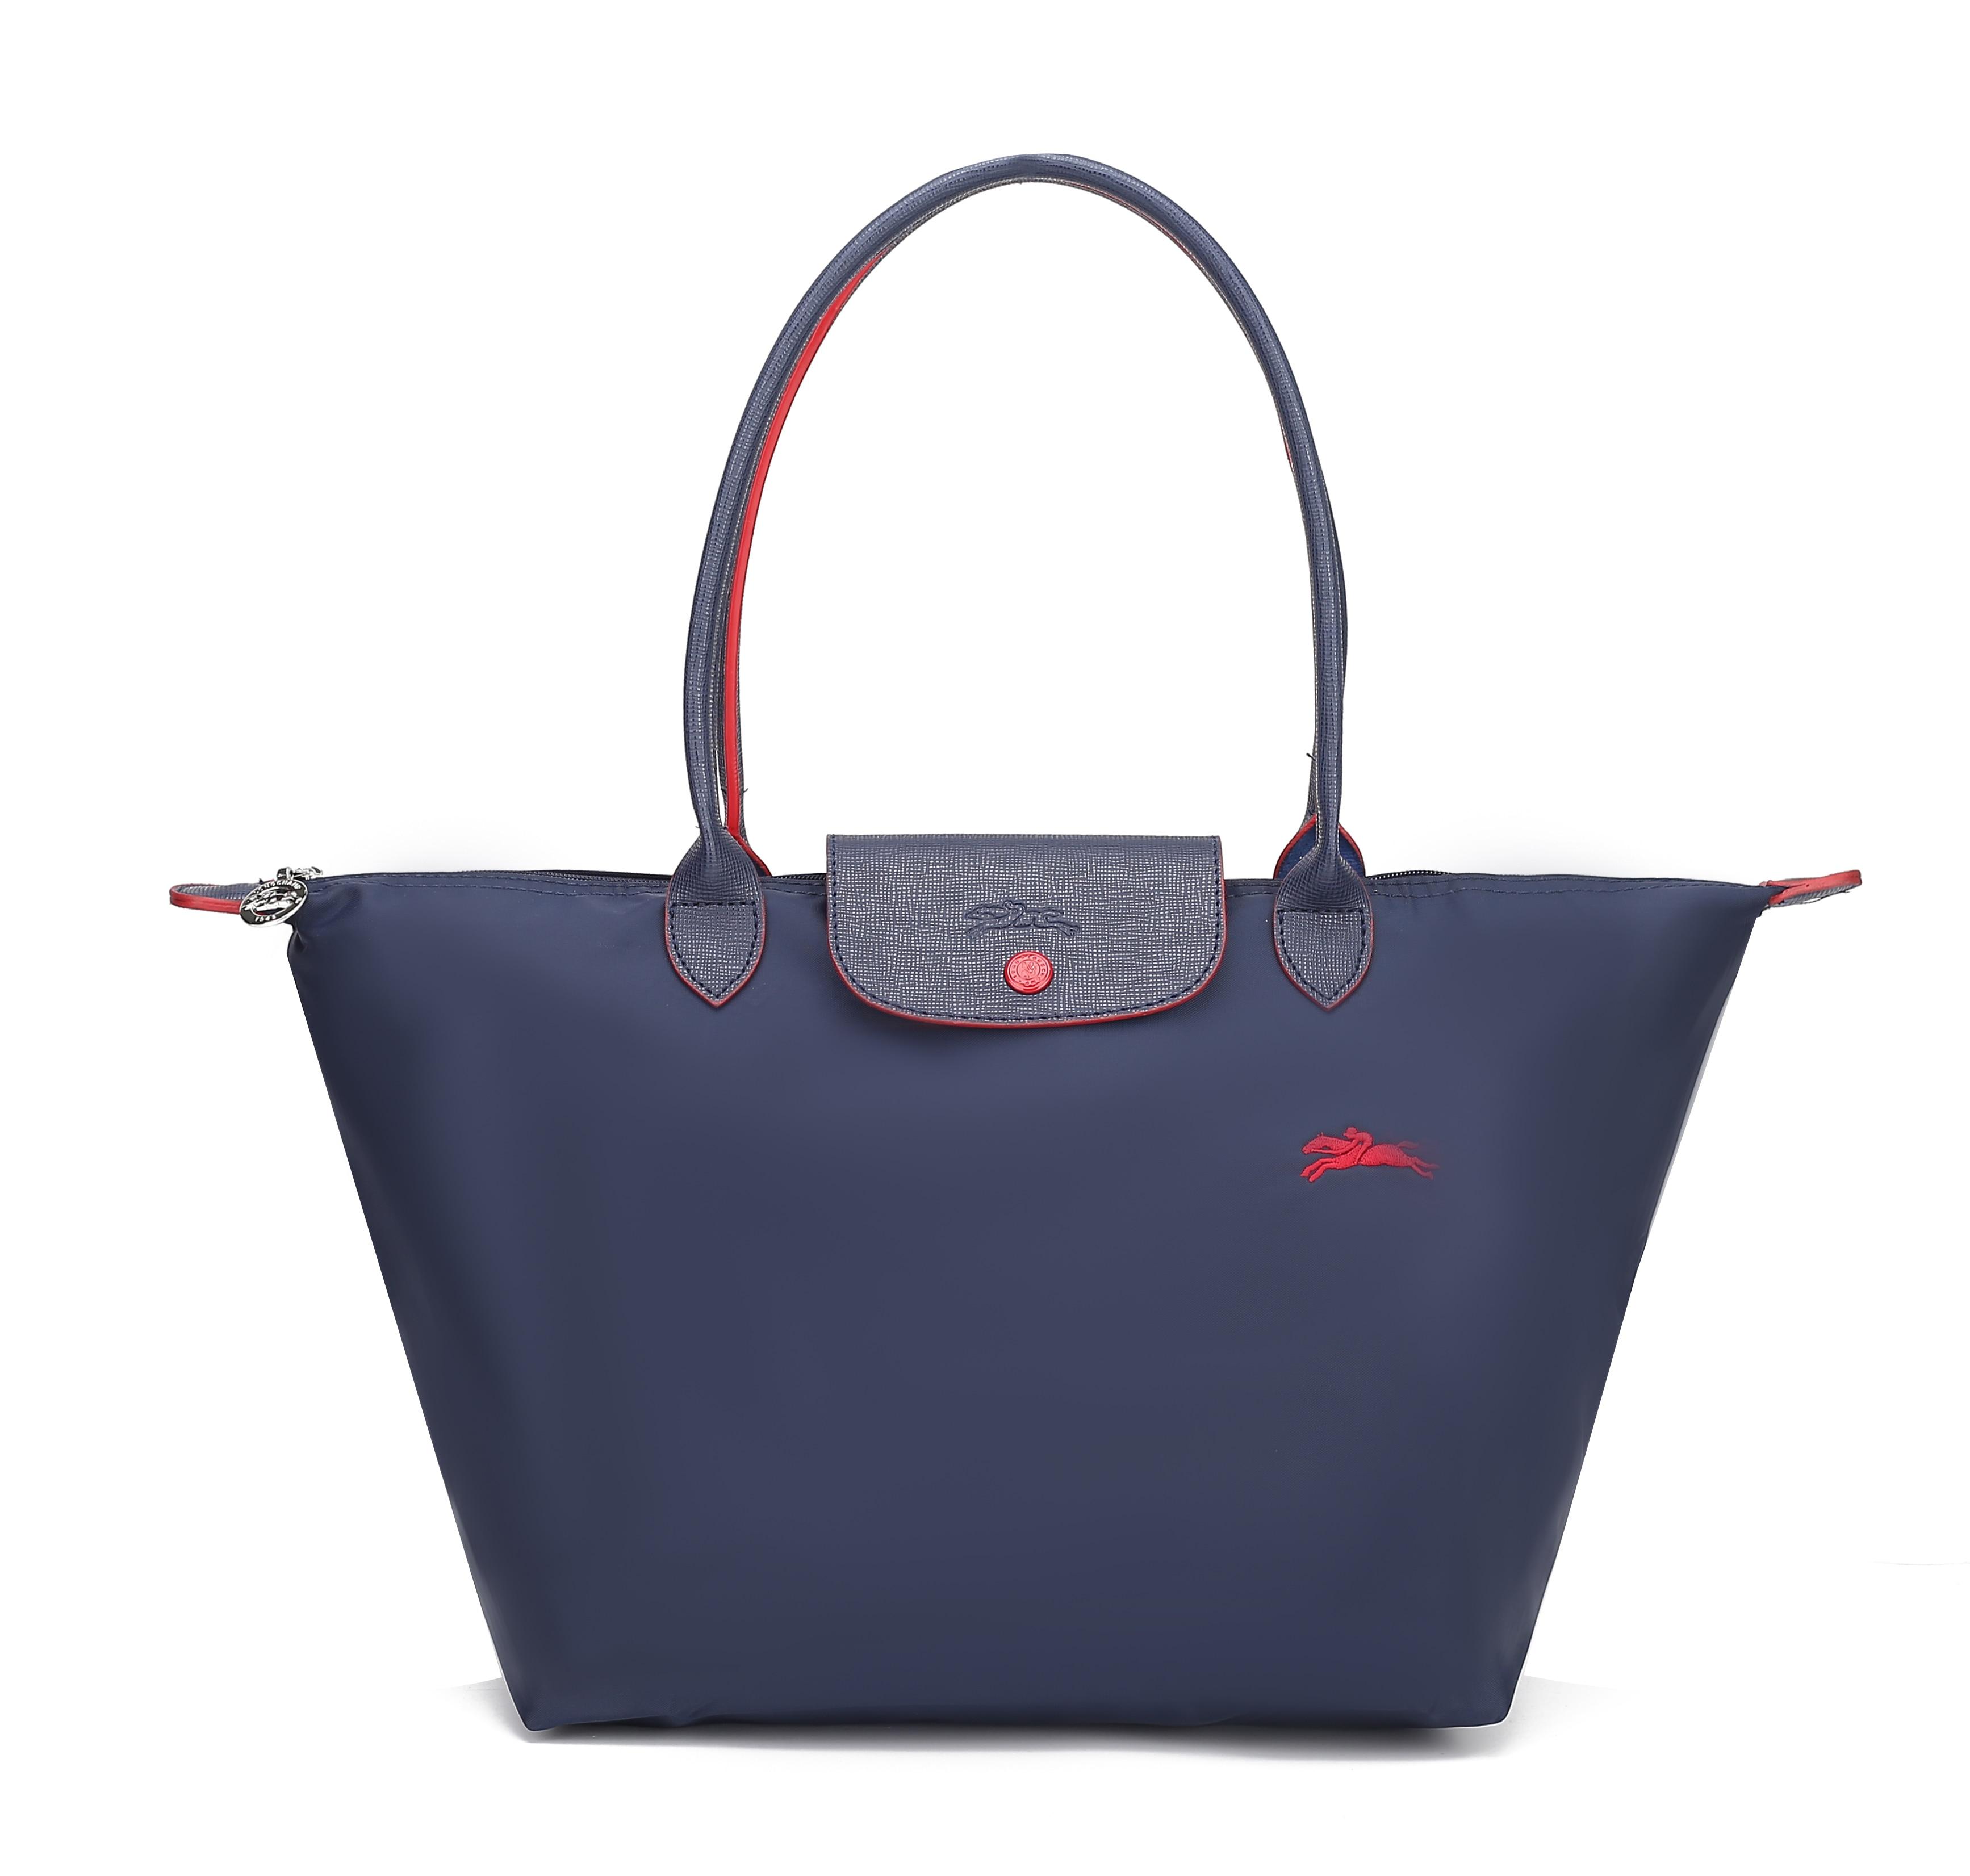 Longchamp Bags Classic women shoulder messenger bag large-capacity shopping women's handbag outdoor folding large storage bag